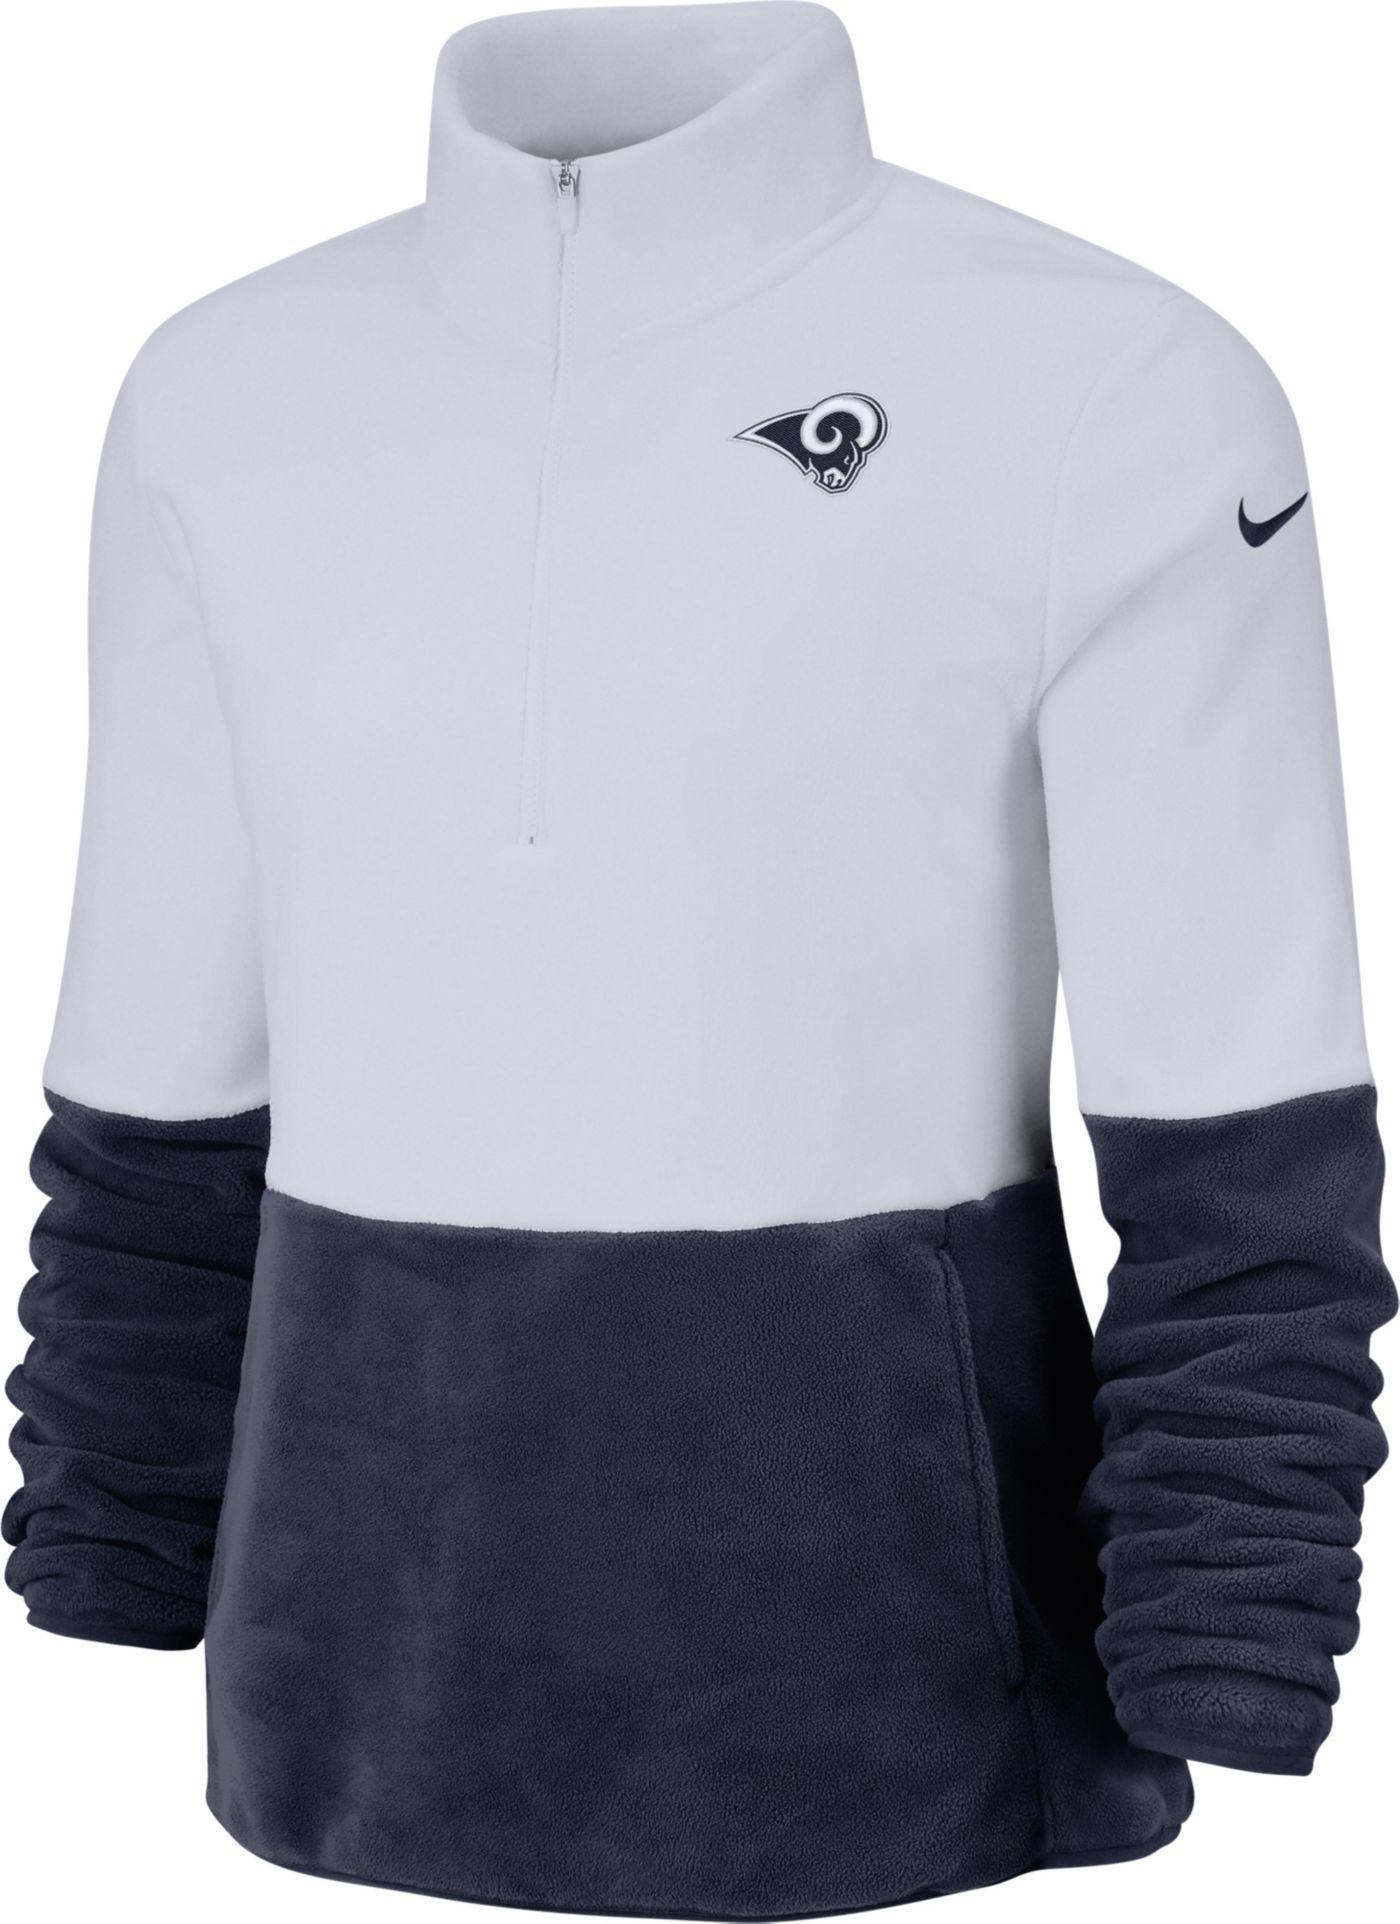 Nike Women's Los Angeles Rams Therma-FIT Fleece Half-Zip Pullover